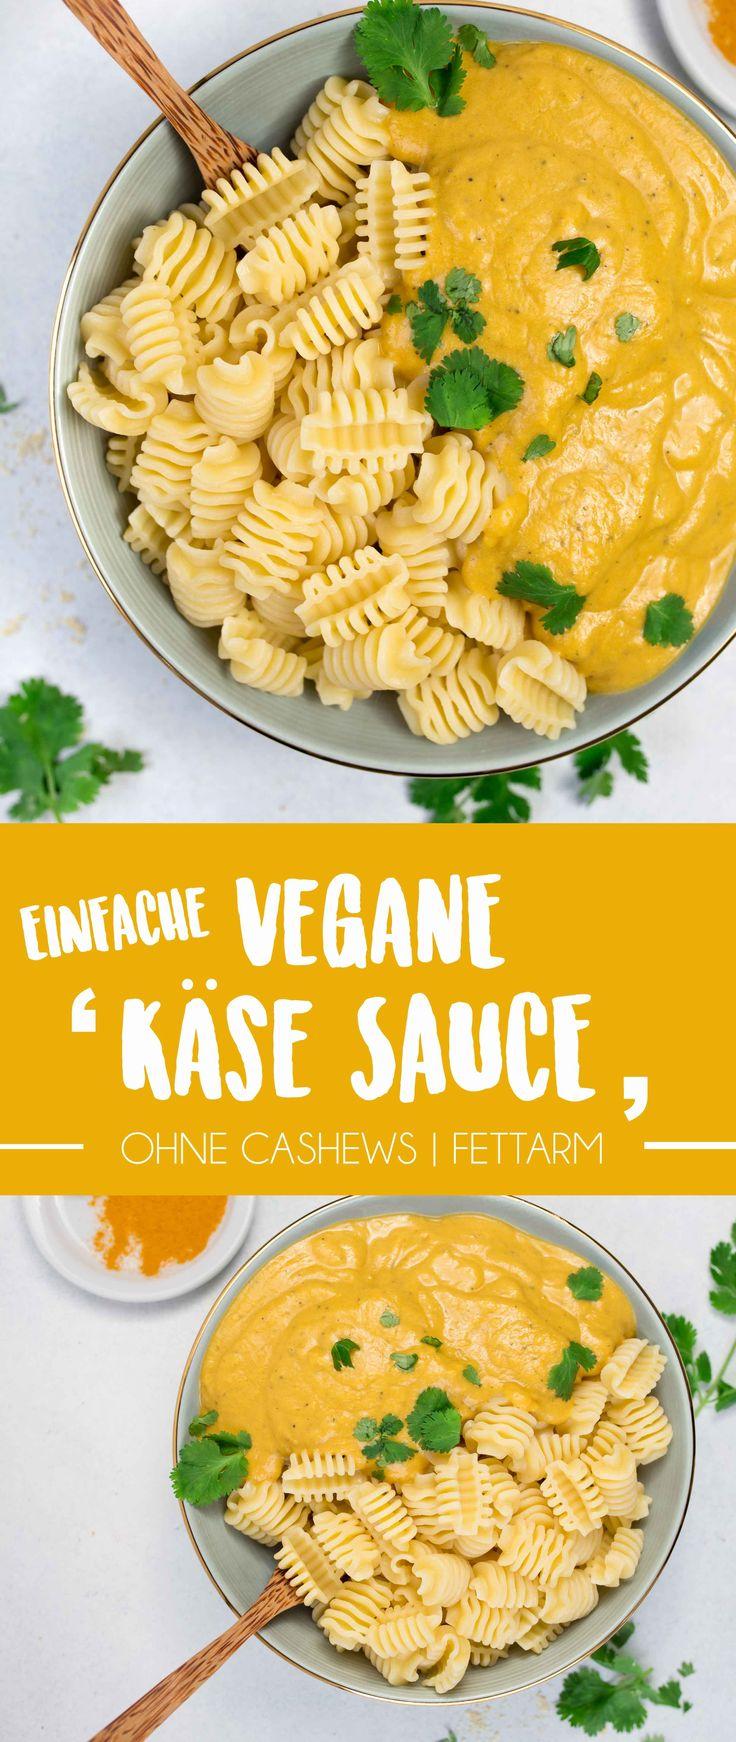 "Einfache vegane ""Käse"" Sauce (fettarm, ohne Cashews)"